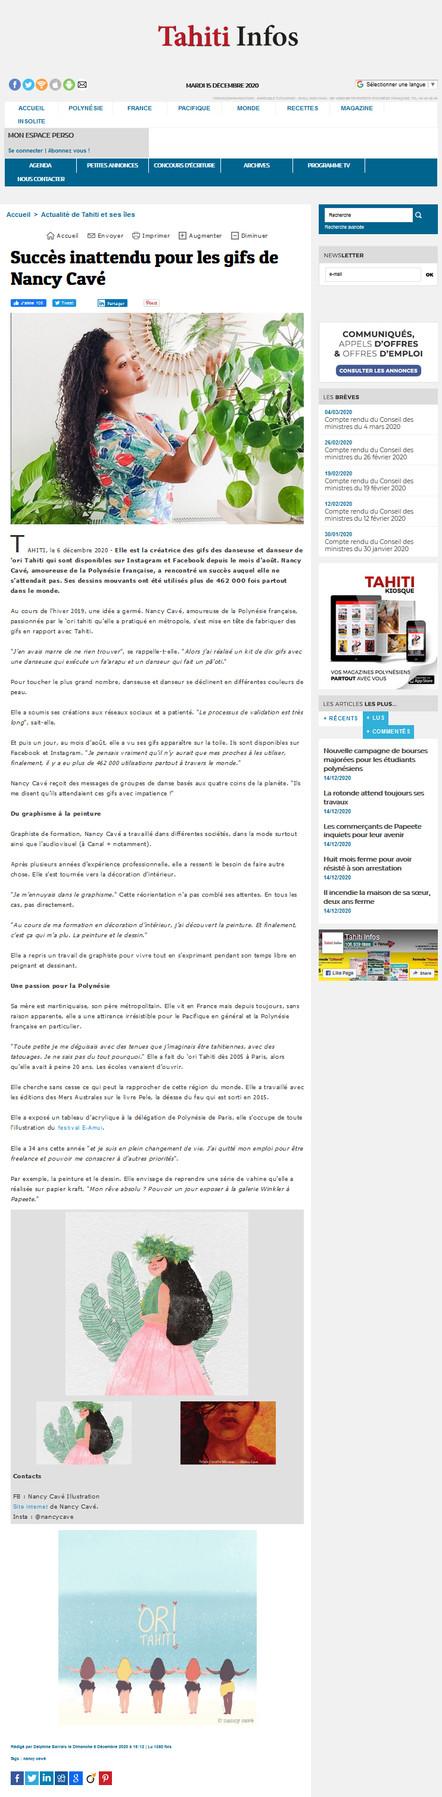 Article Tahiti Infos